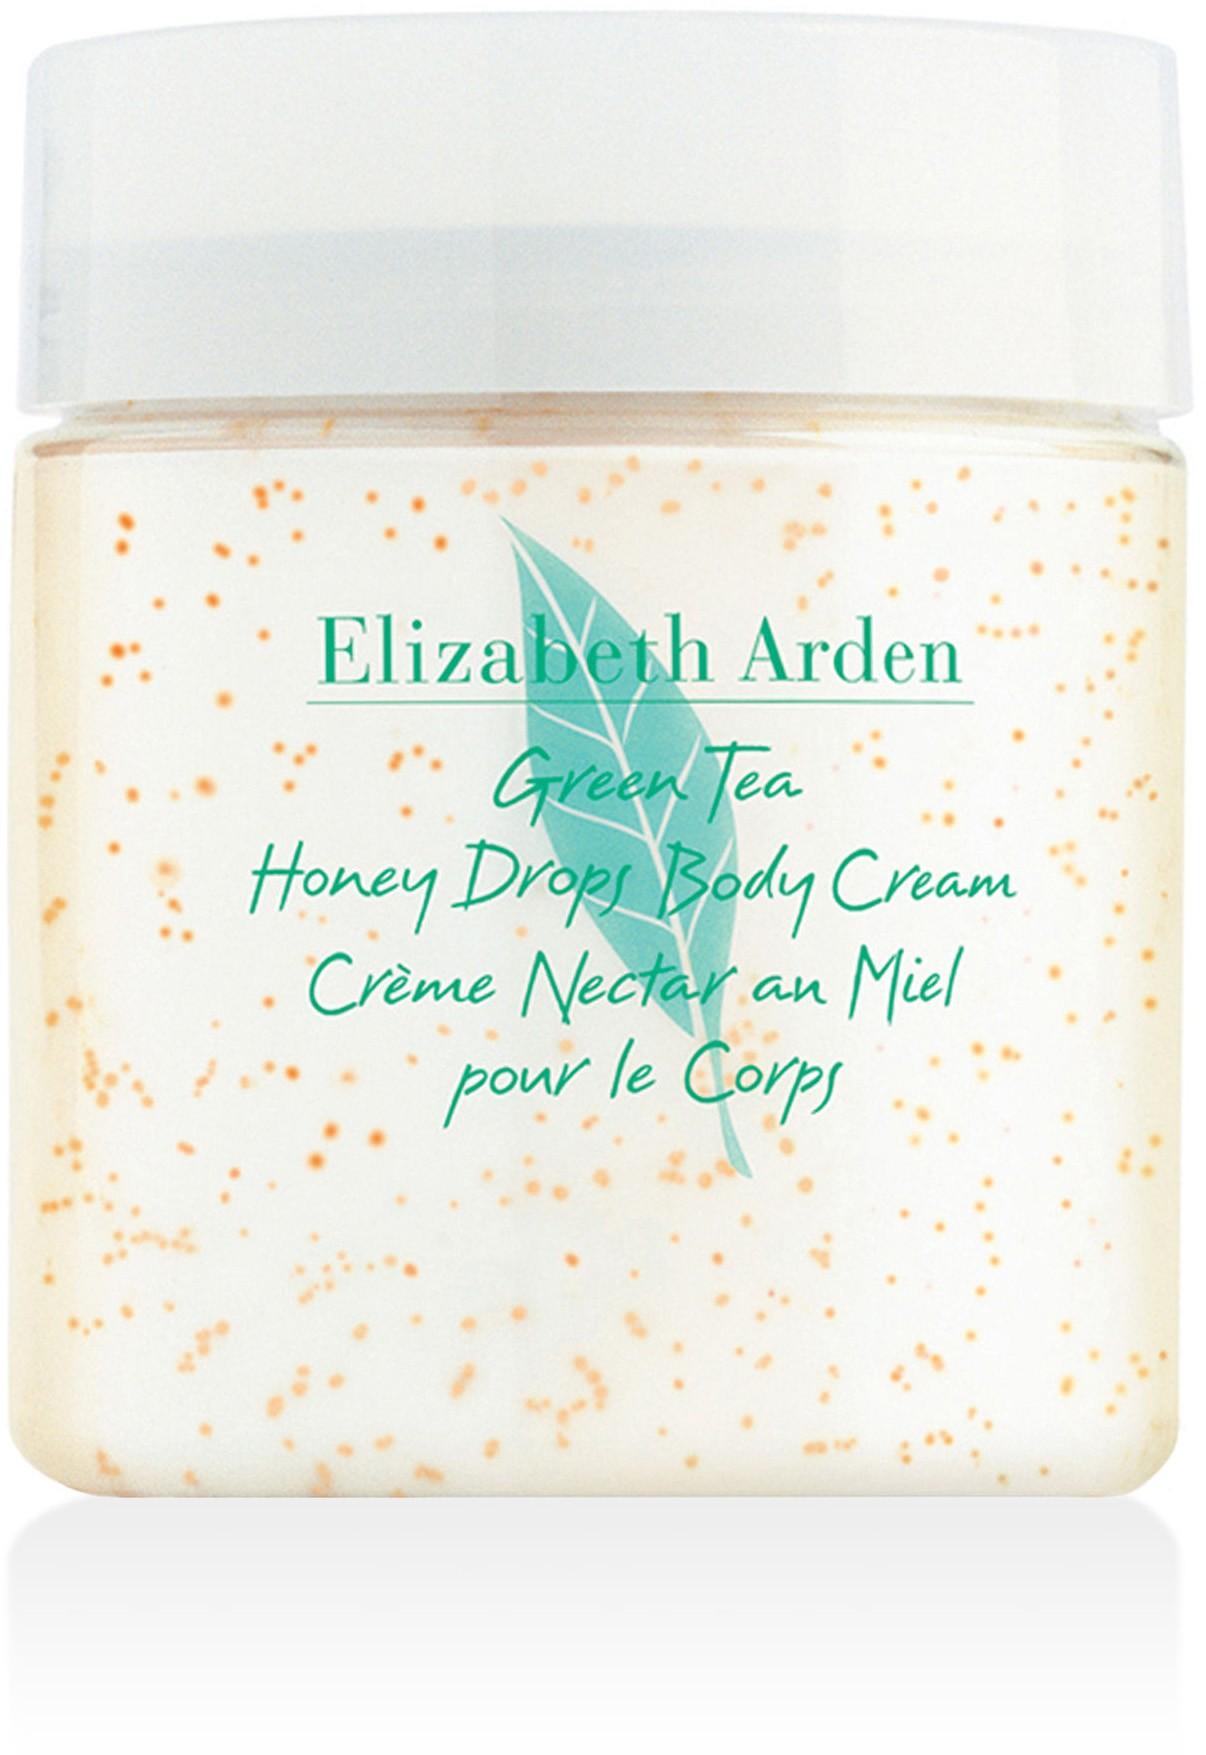 Elizabeth Arden kehakreem Green Tea Honey Drops 5..